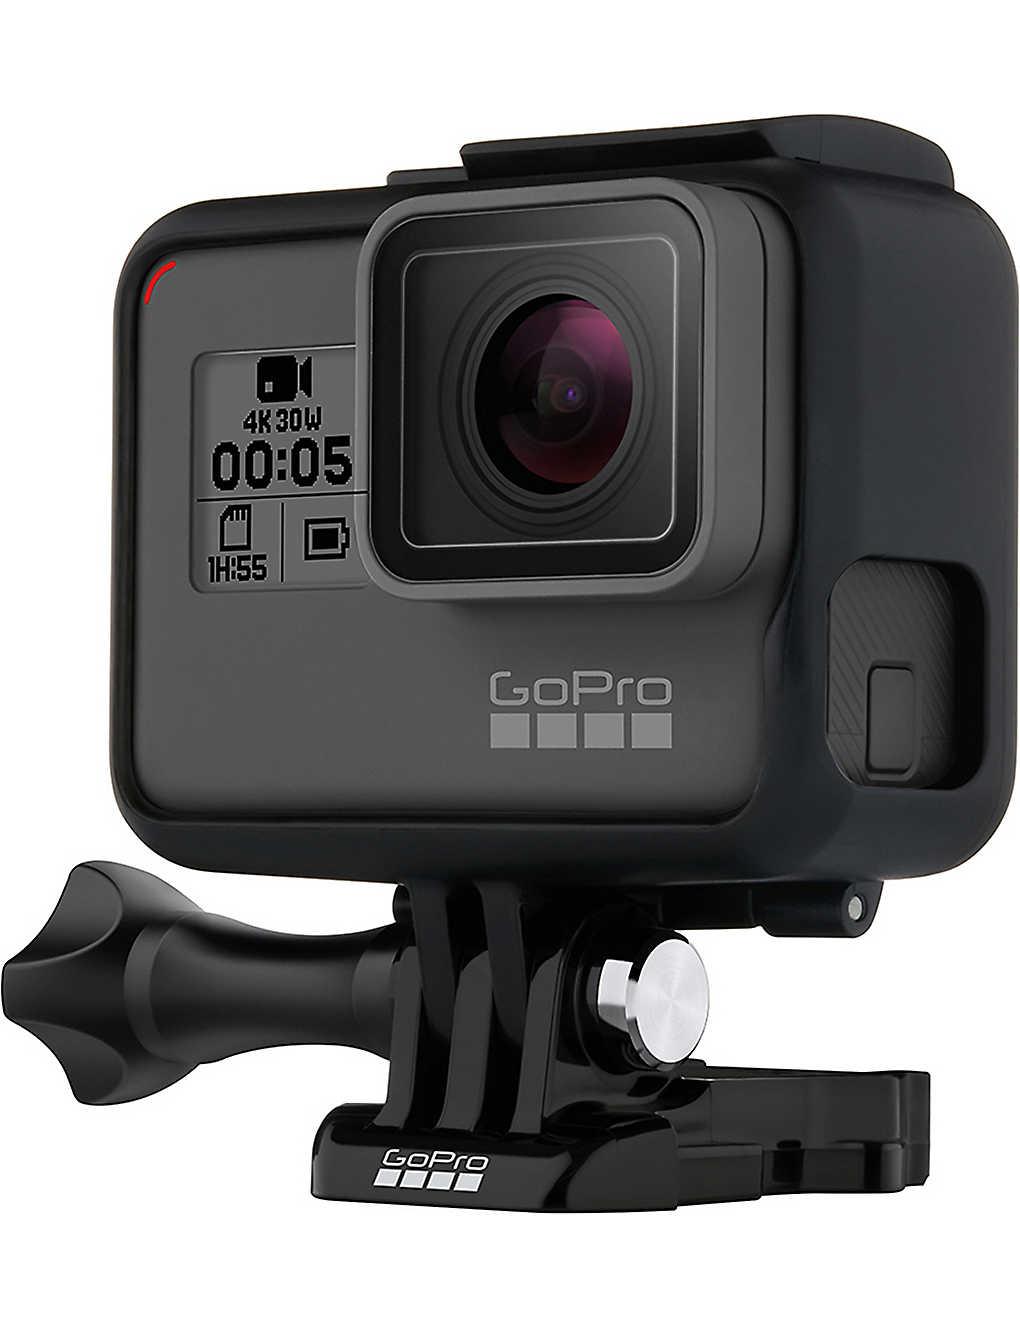 d9fa294d3bd GOPRO - HERO5 black action camera